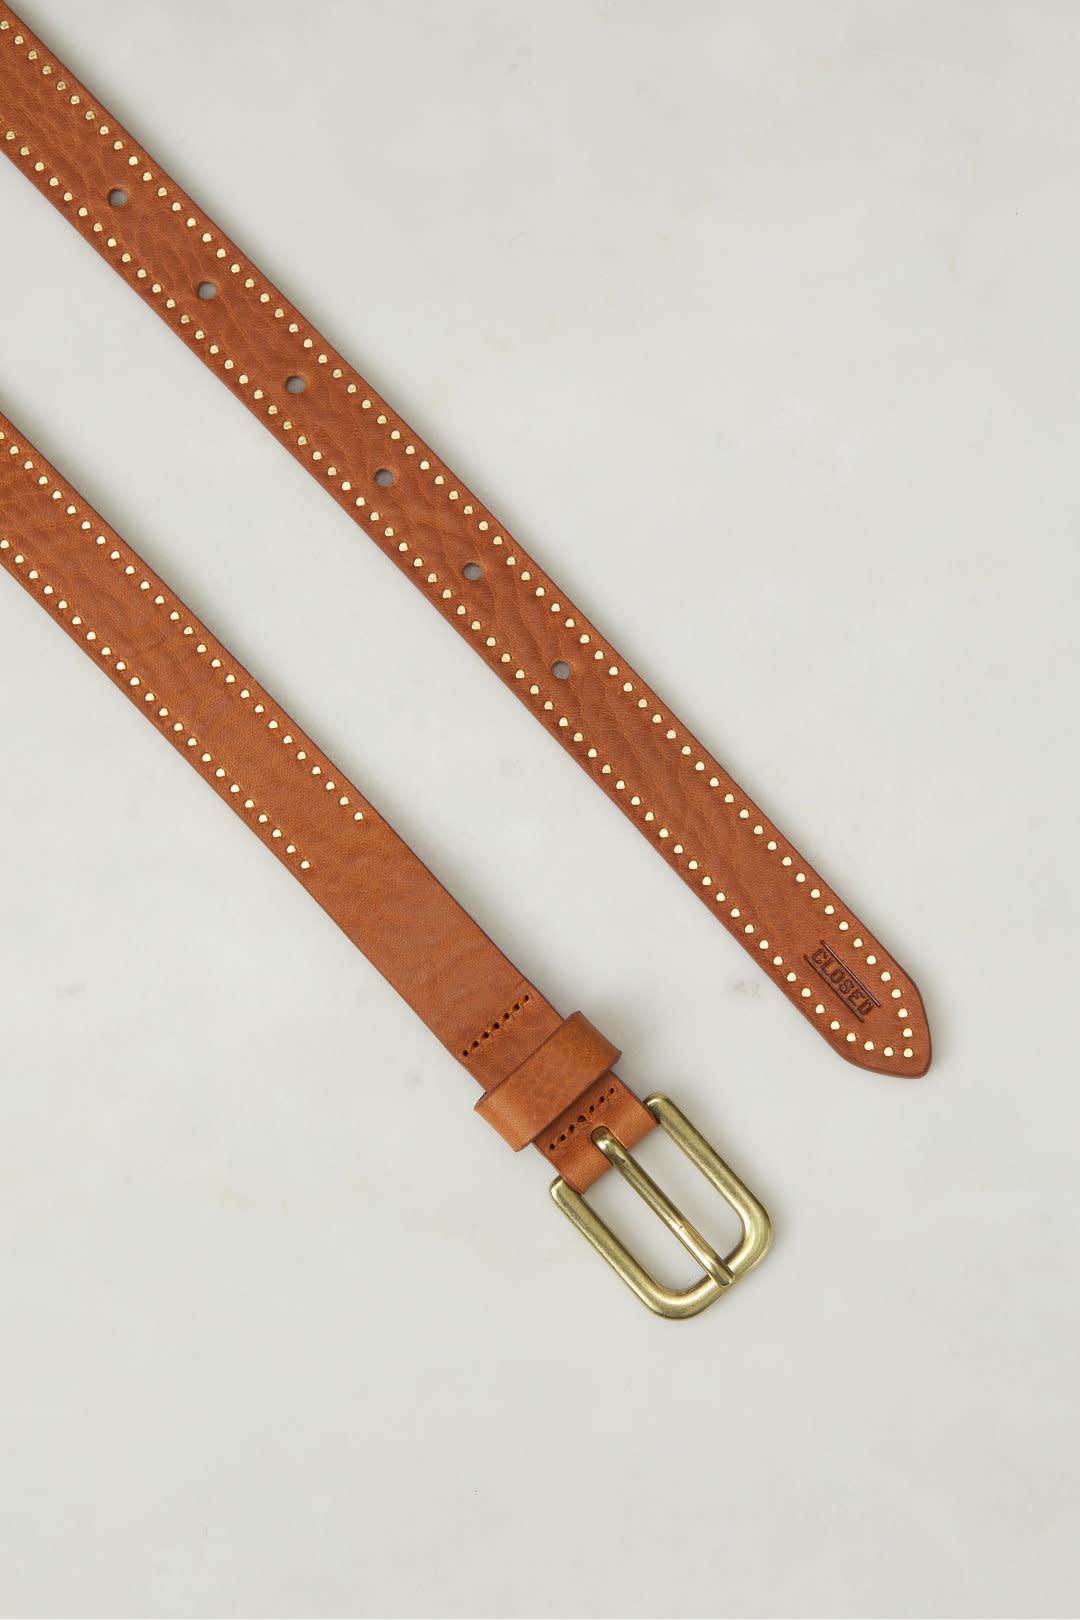 Belt caramel C90218-2